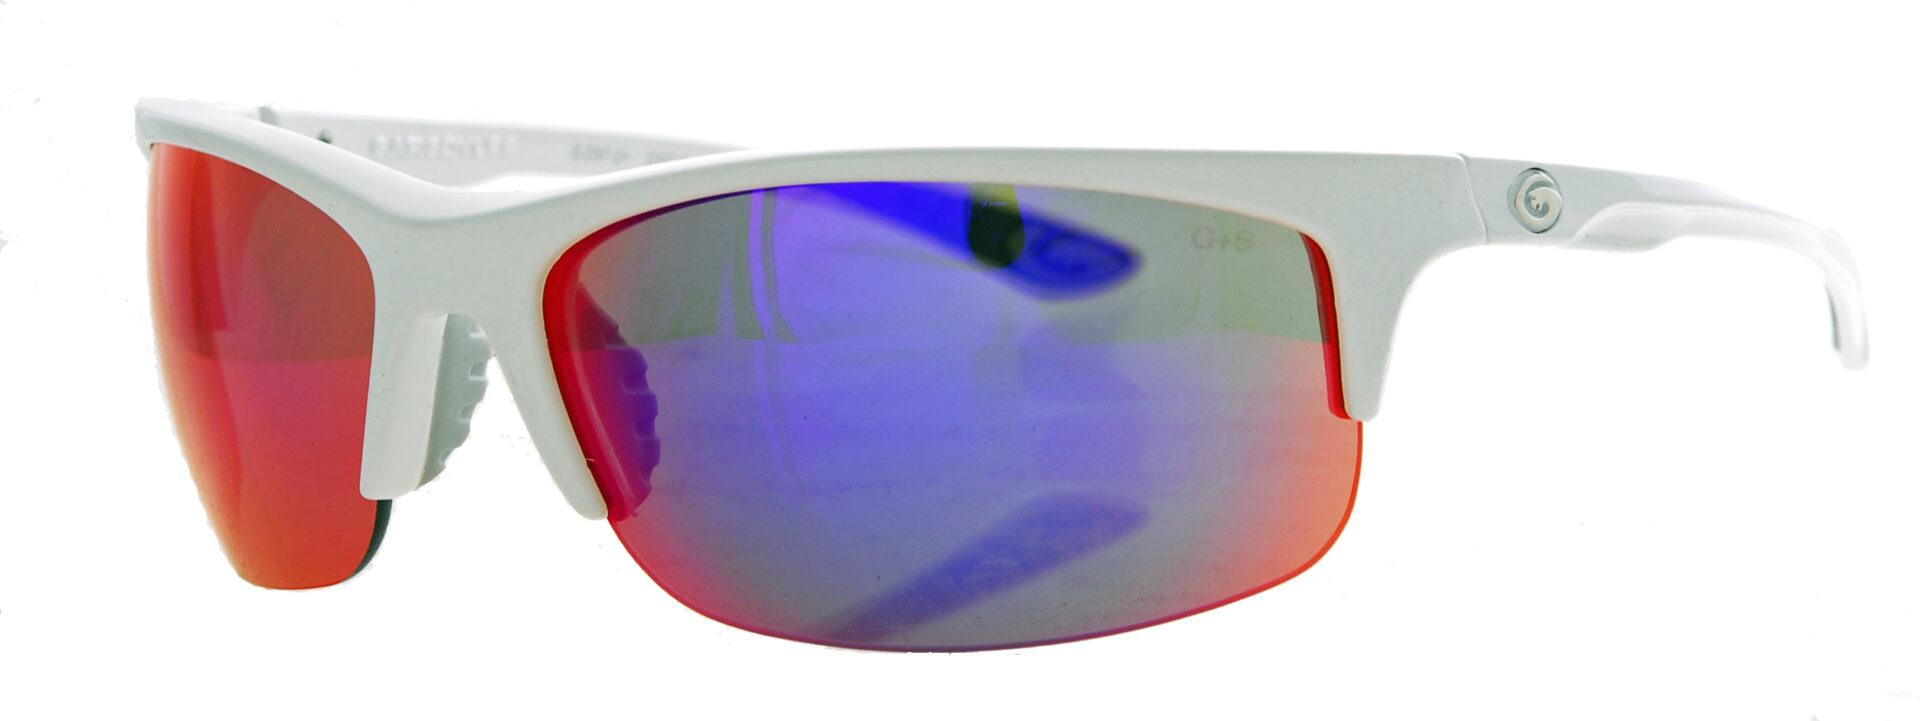 Plasma mirrored smoked shades in a white frame